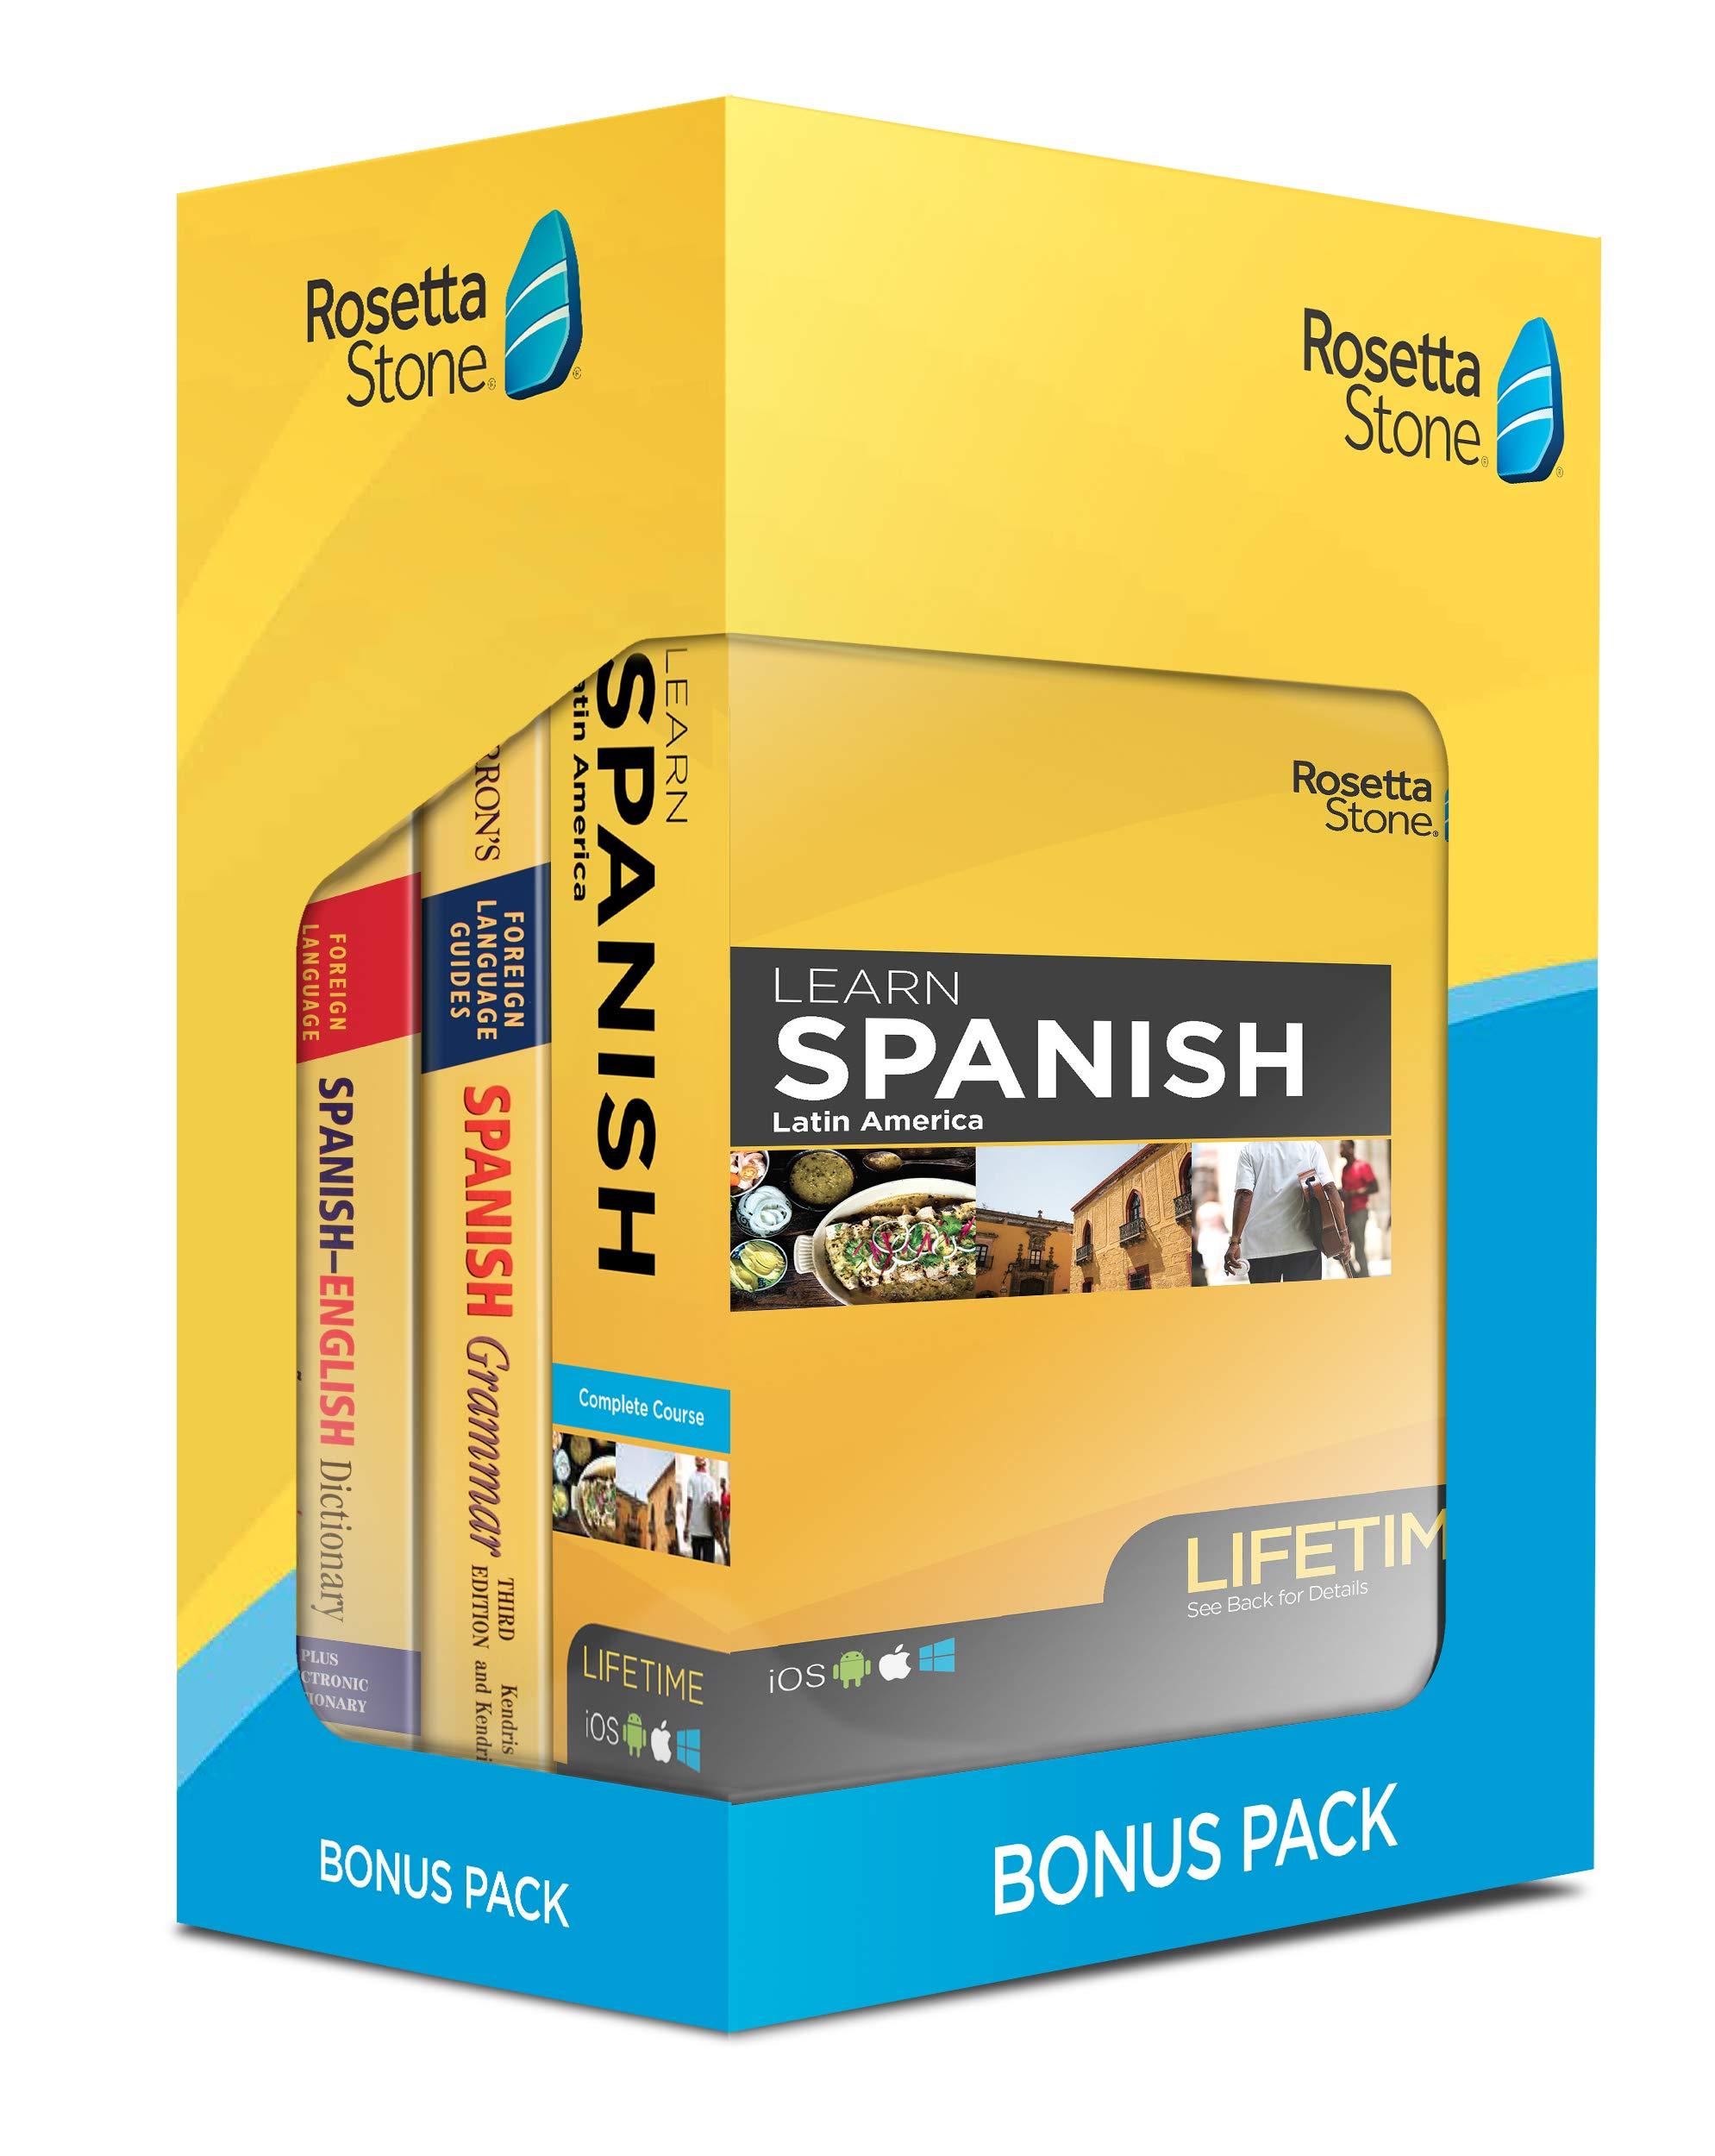 Learn Spanish: Rosetta Stone Bonus Pack Bundle (Lifetime Online Access + Grammar Guide and Dictionary Book Set) by Rosetta Stone